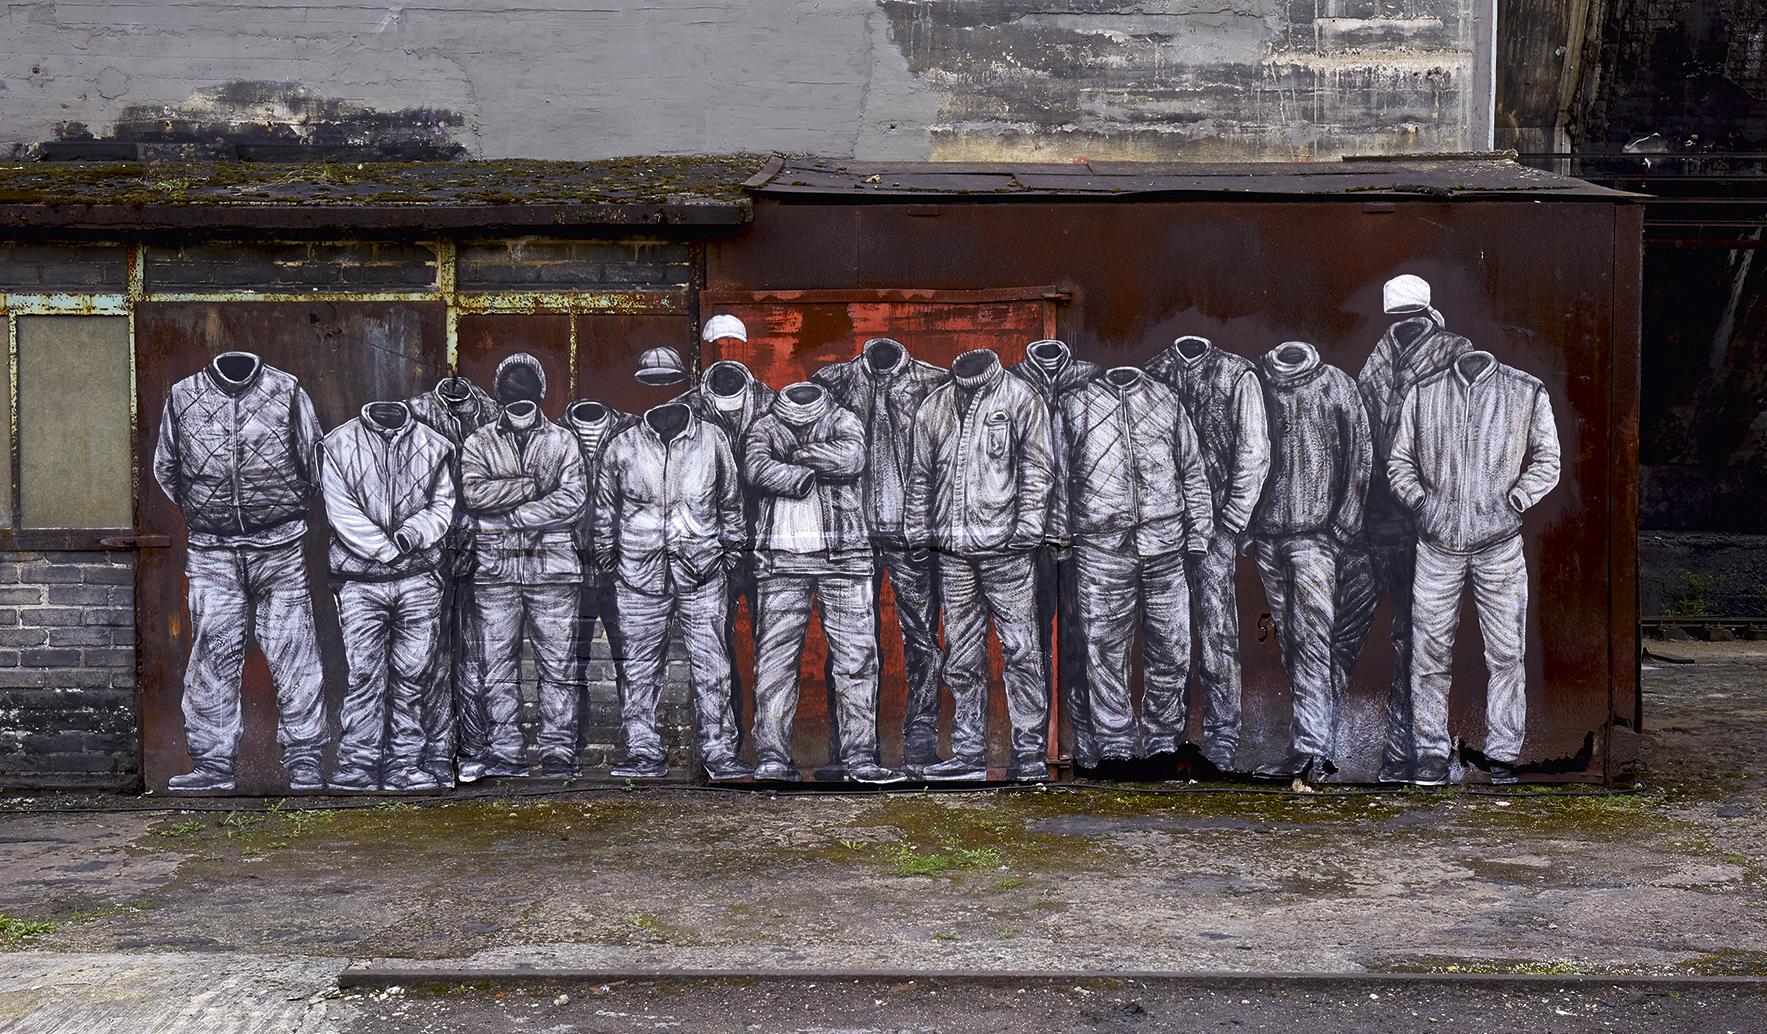 Levalet: Plan Social, 2017 | Tusche und Acryl auf Papier, 190 x 160 cm |Ort: Kohleturm Copyright: Weltkulturerbe Völklinger Hütte/Karl Heinrich Veith